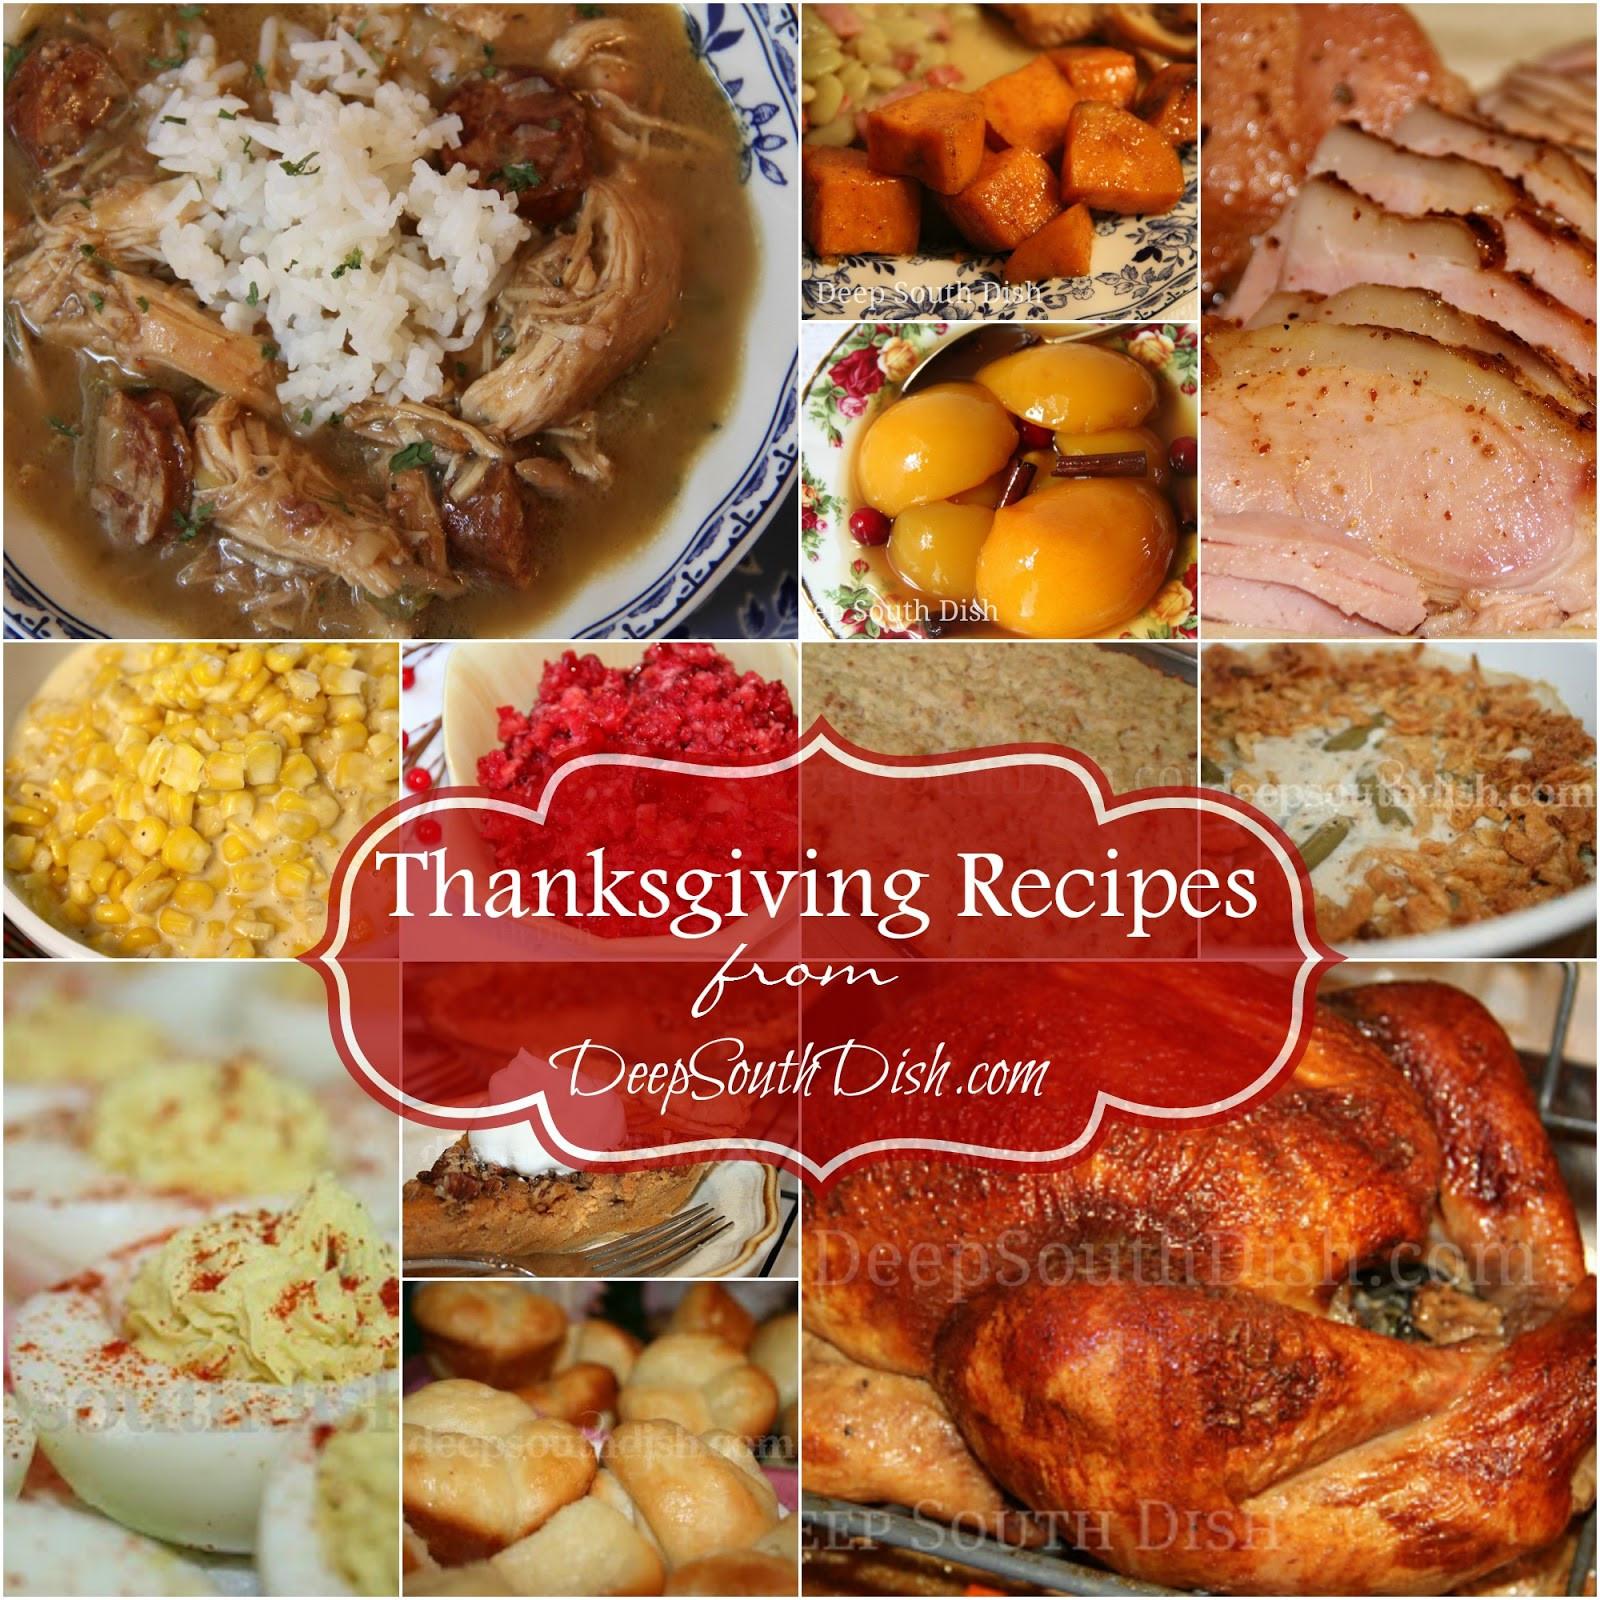 African American Thanksgiving Recipes  Deep South Dish Deep South Southern Thanksgiving Recipes